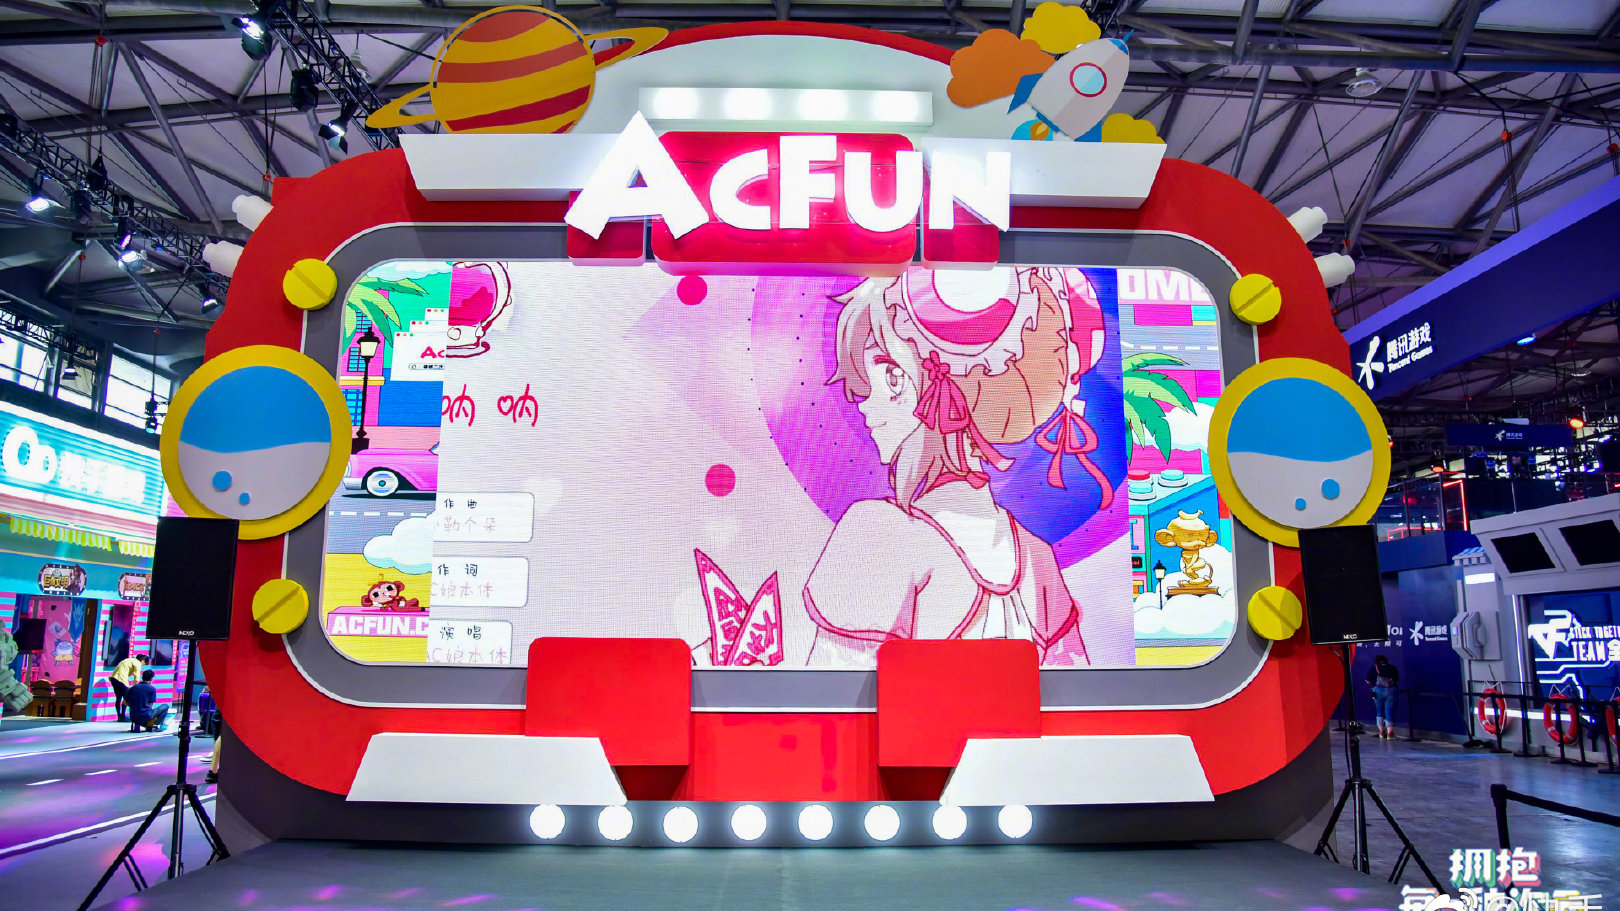 【CJ ACFUN现场】8月2日 A站主舞台 哎呦伦仔 阿呆 未南表演环节录屏